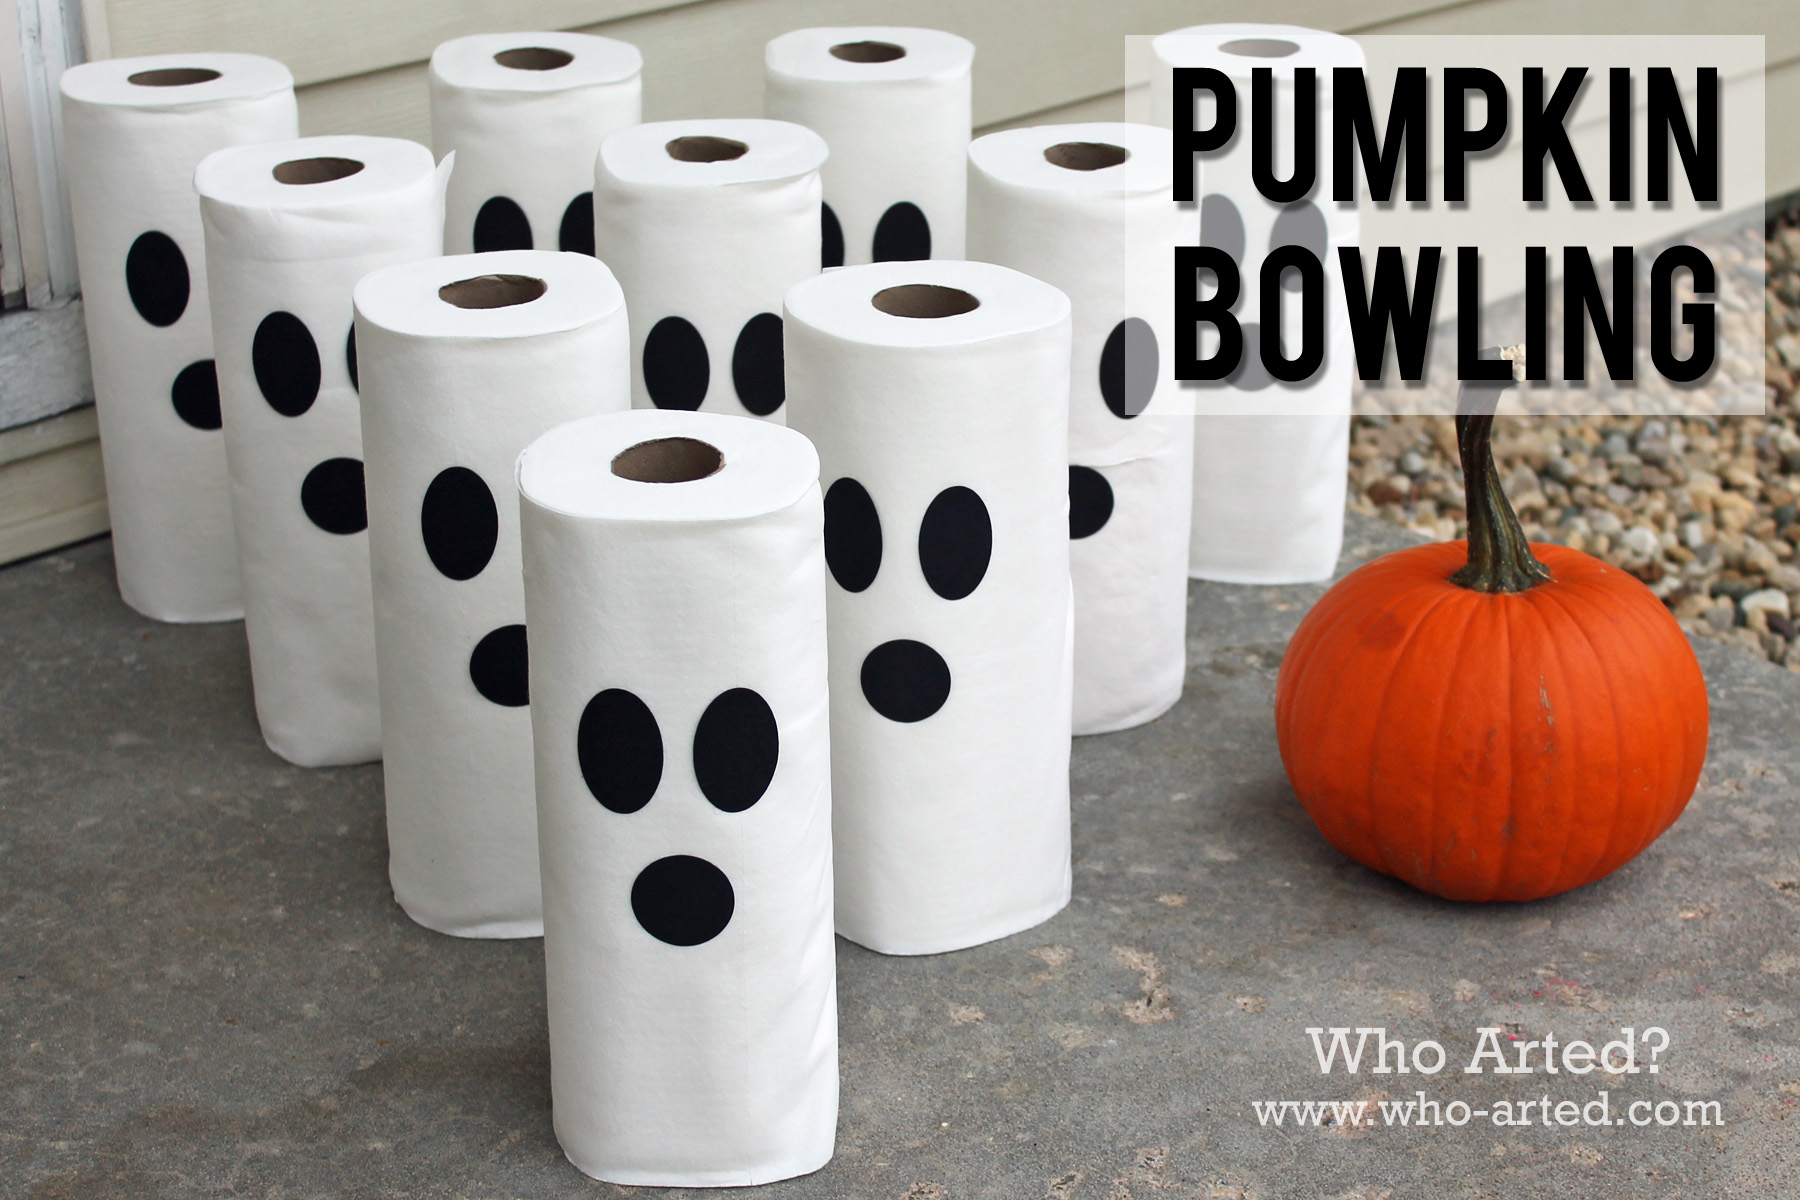 pumpkin bowling 07 - Halloween Gmaes